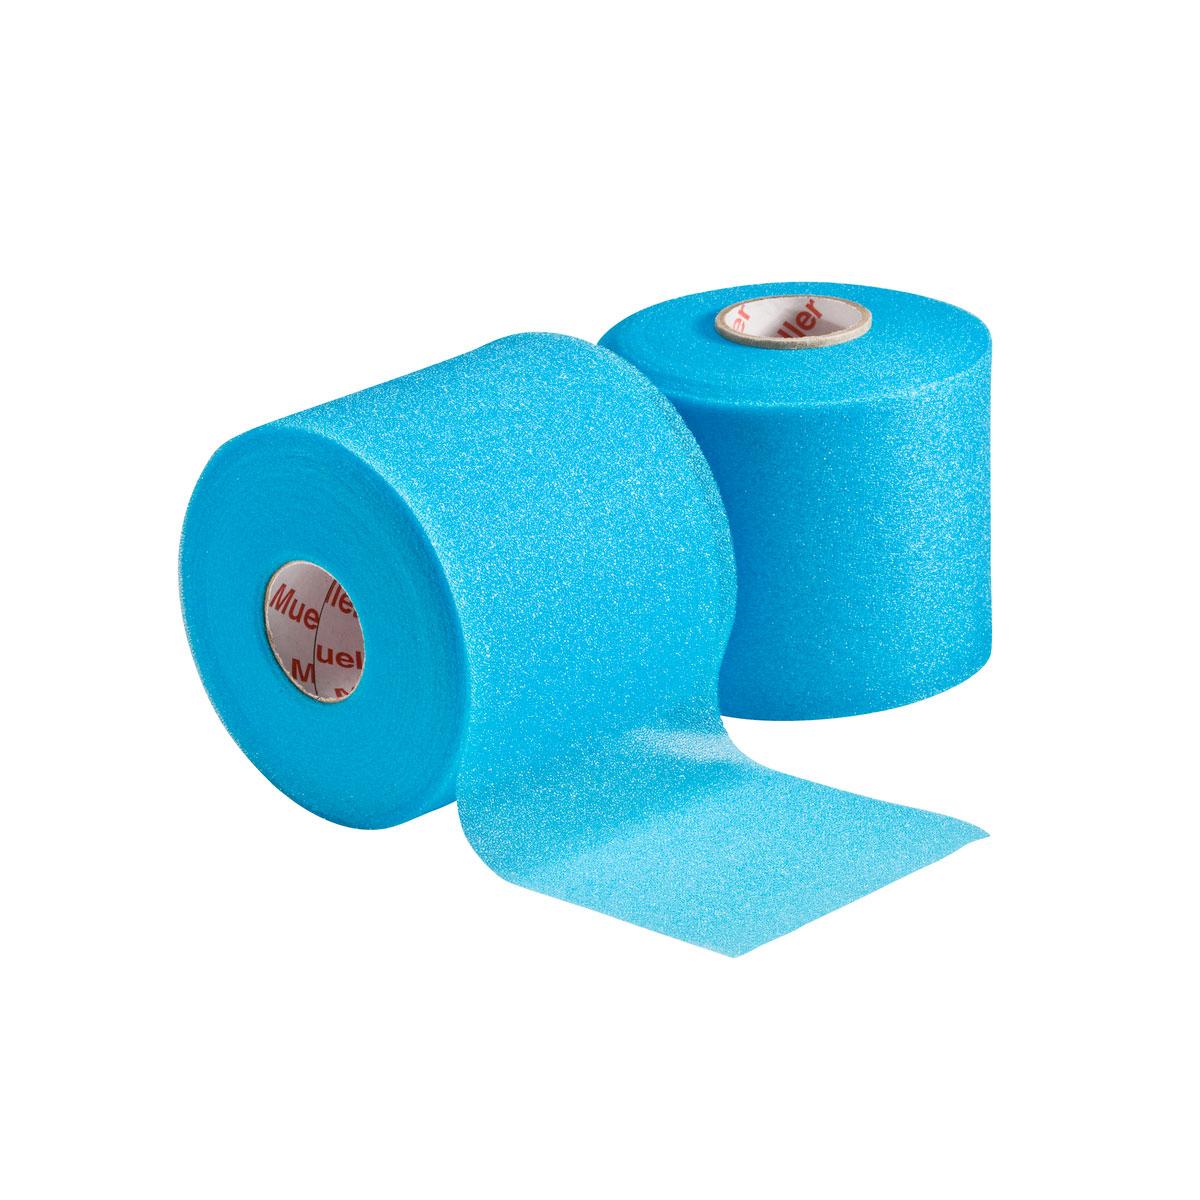 M-Wrap - 2-Pack, Turquoise,Aqua, swatch